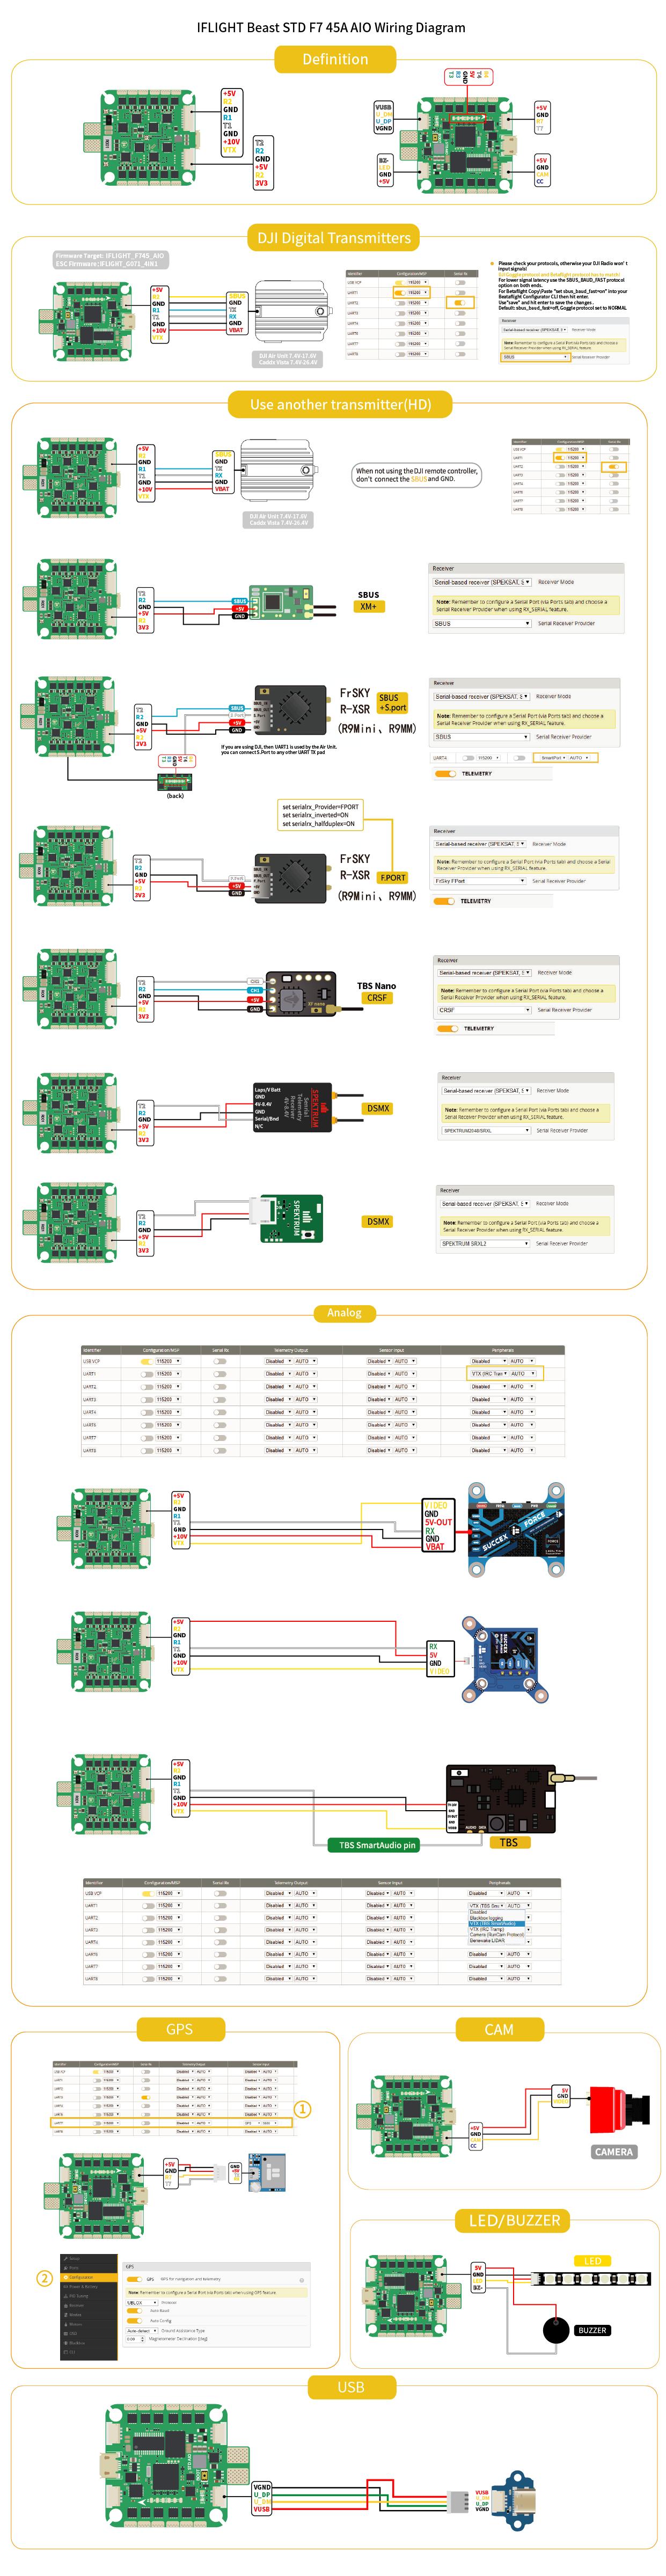 Iflight Beast STD F7 45A AIO Wiring Diagram